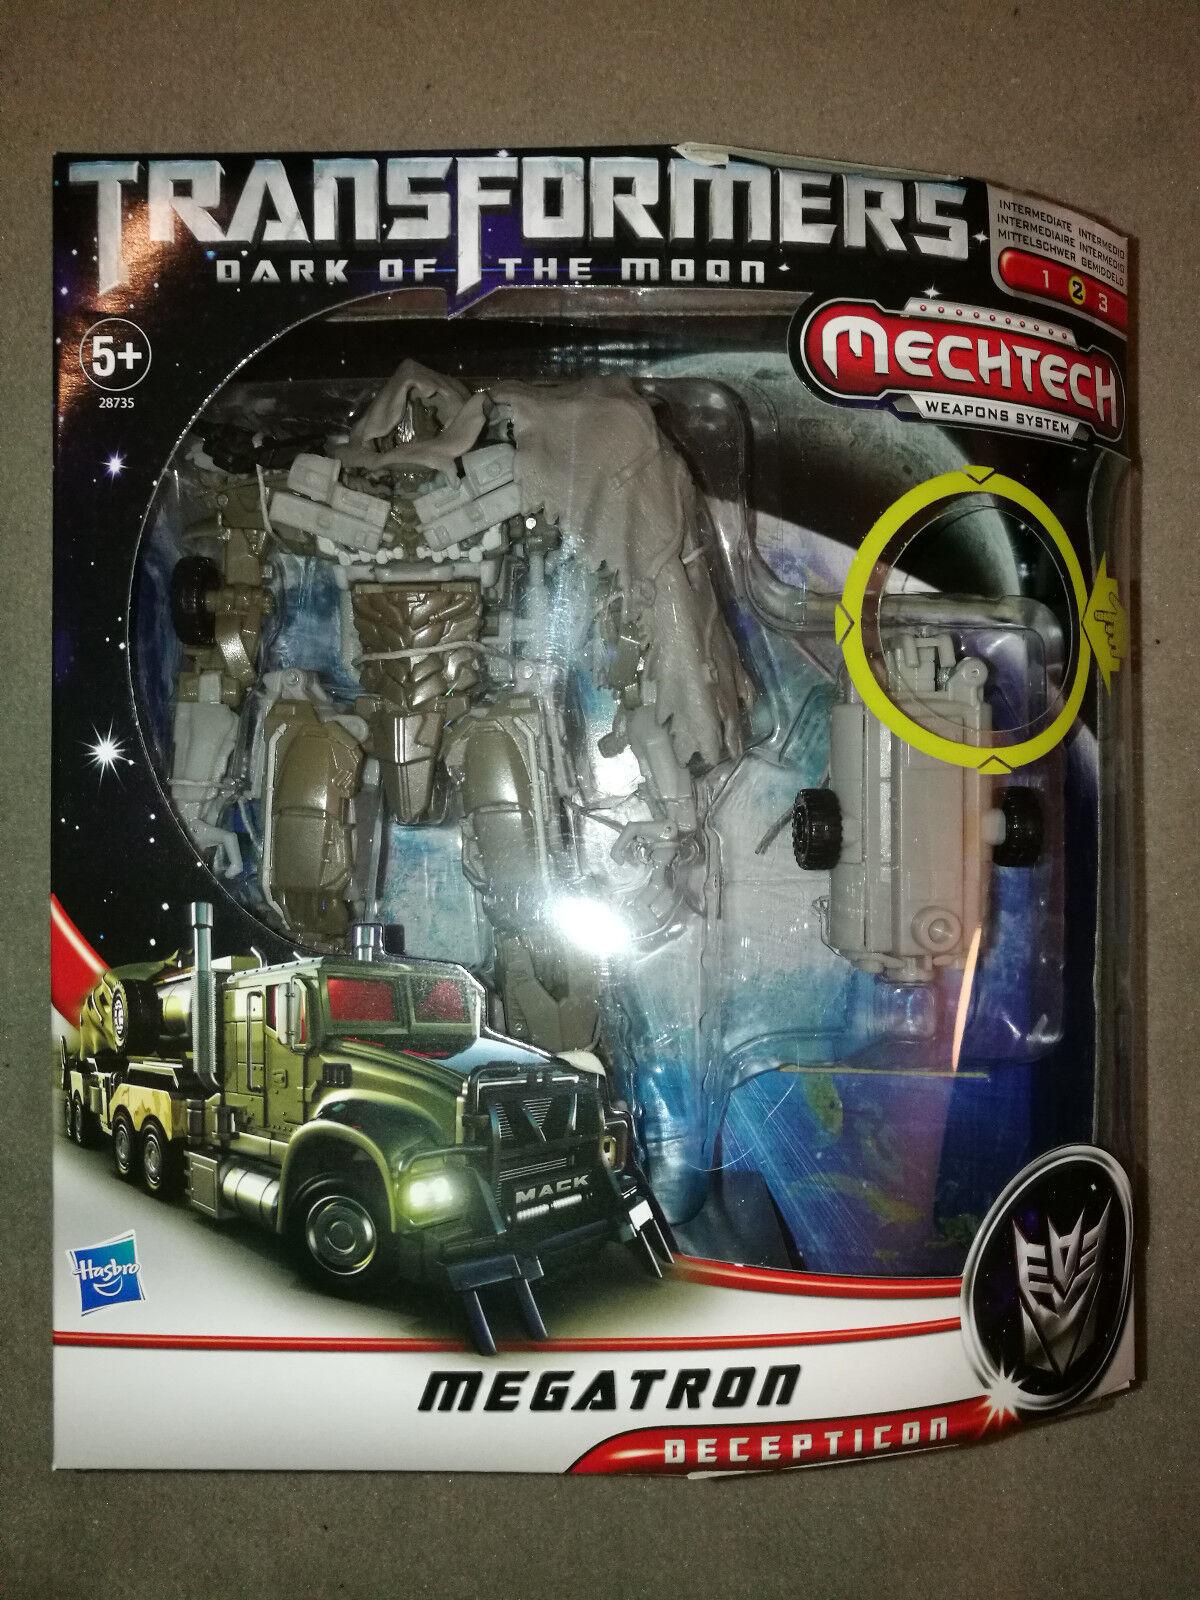 Transformers Movie Dark of the Moon dotm Voyager class Megatron Hasbro